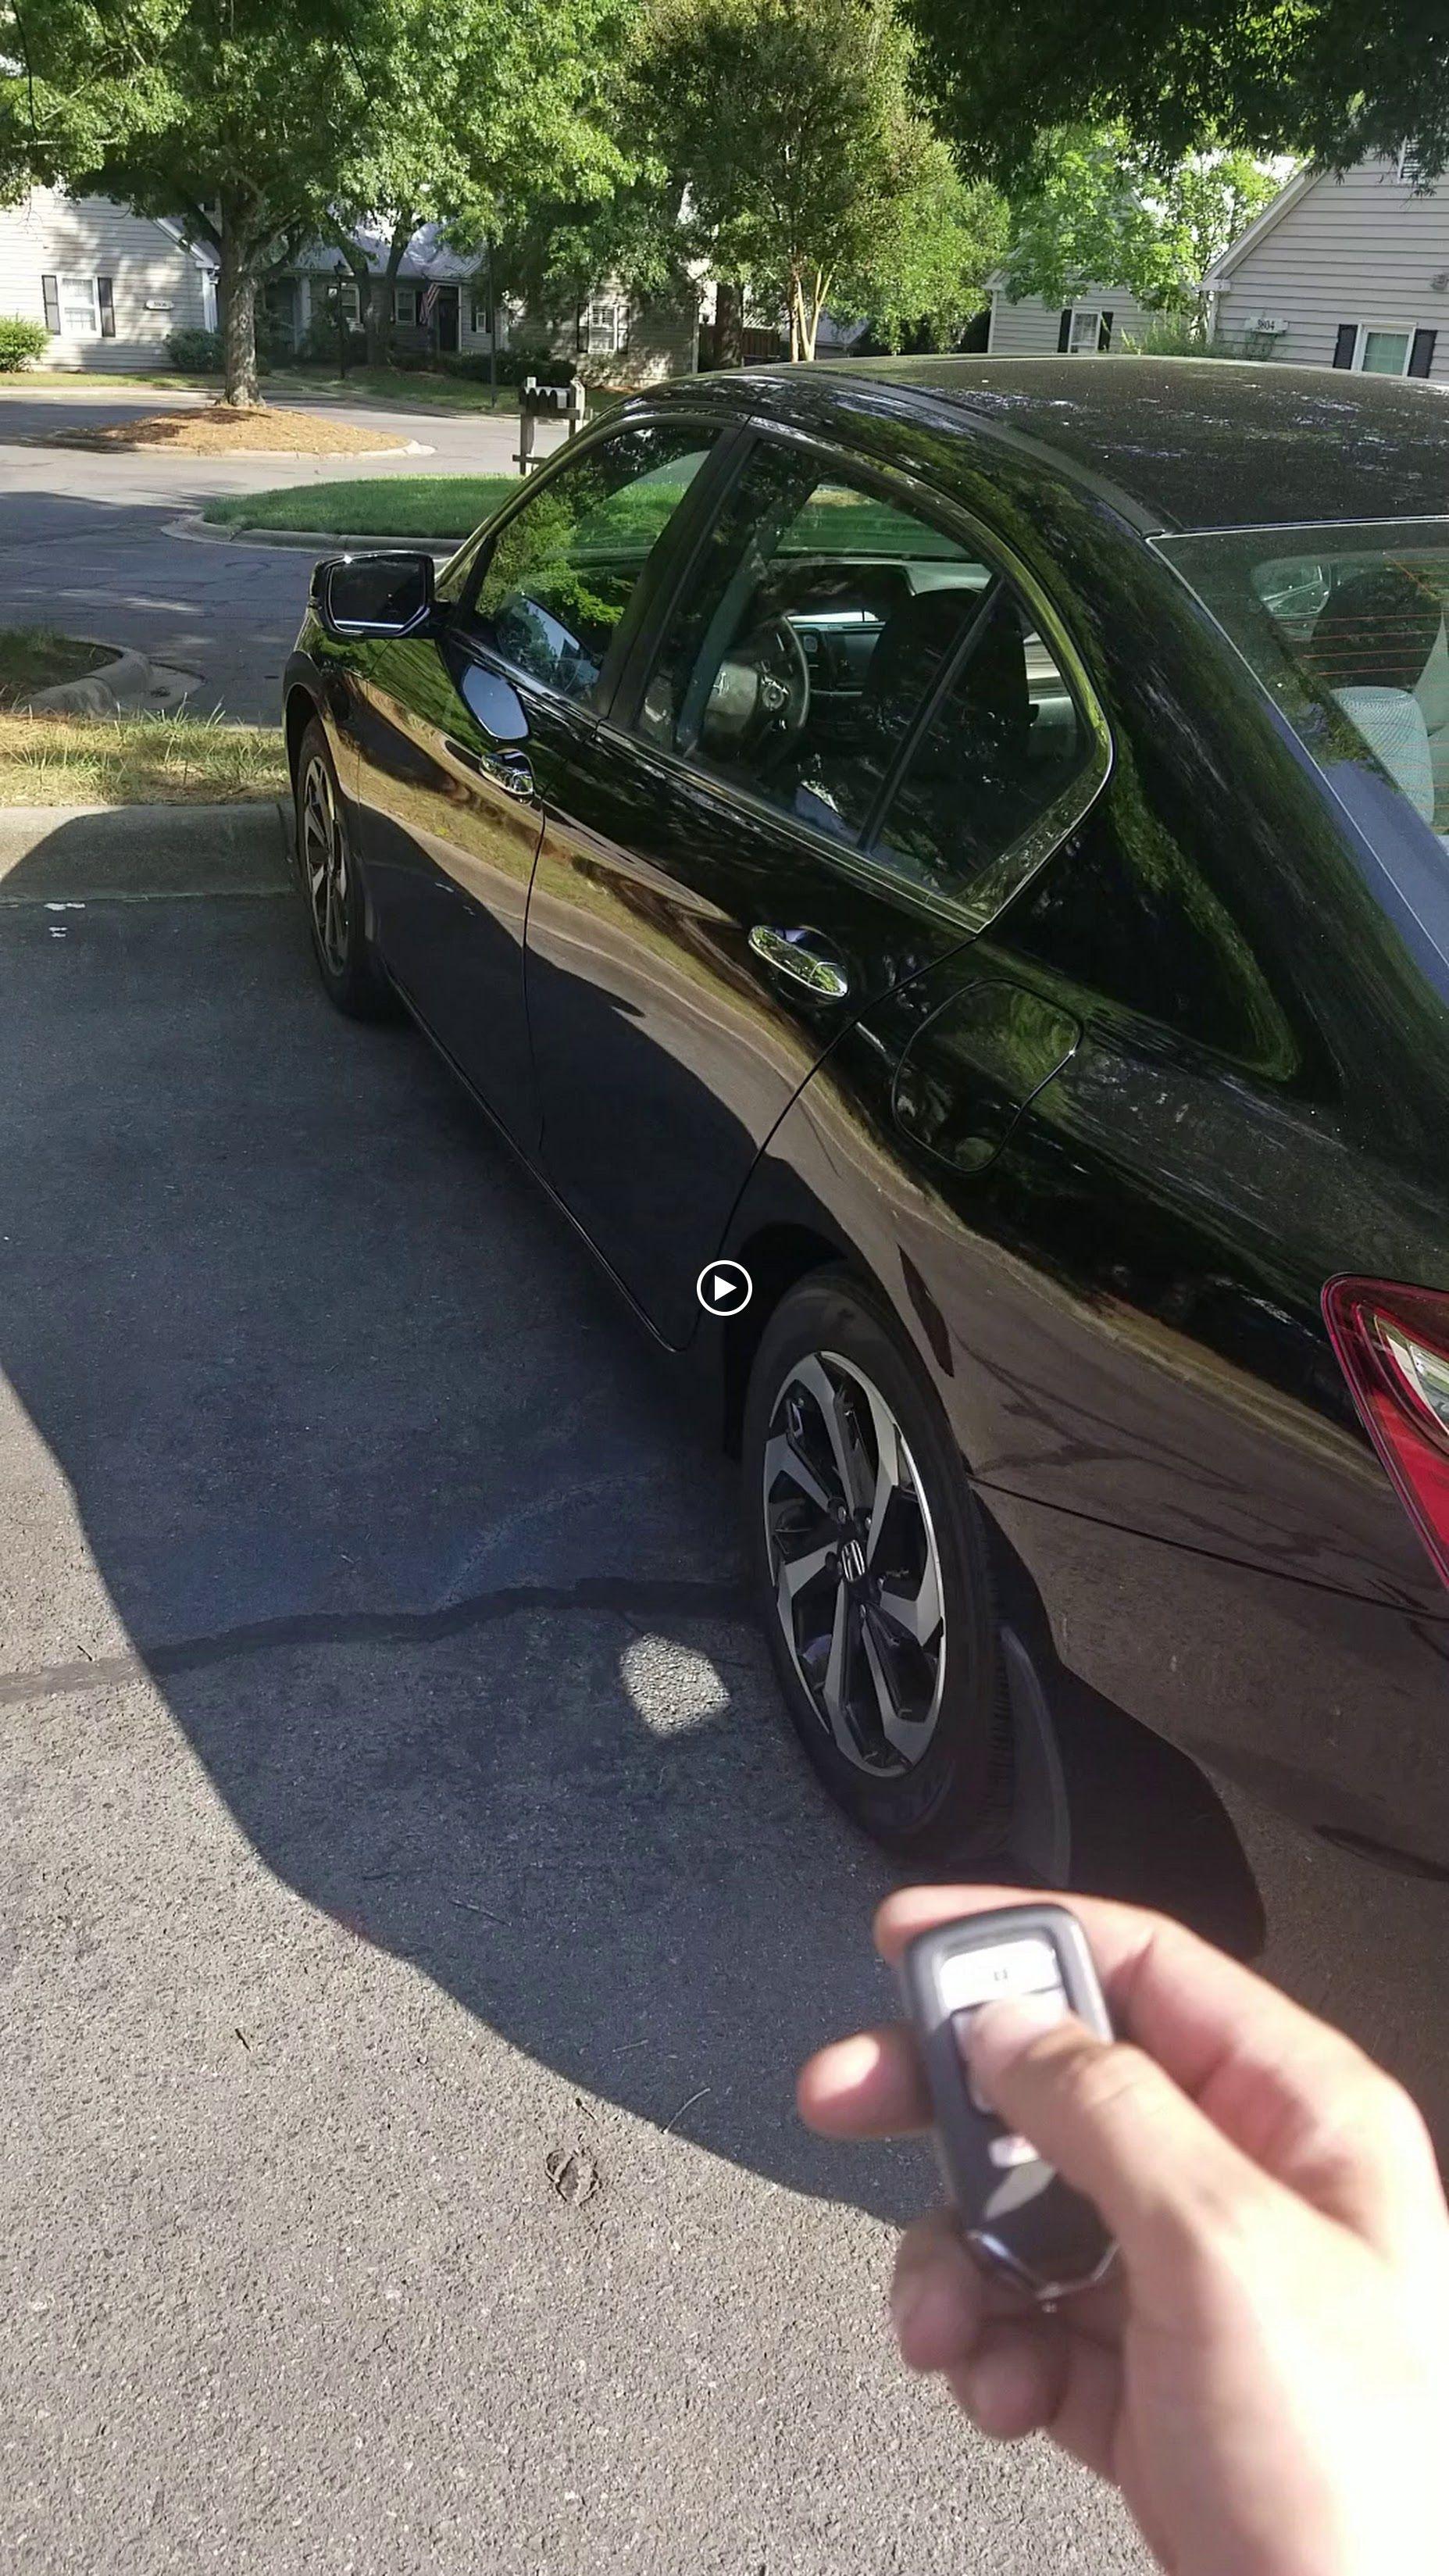 29+ Car lockout help near me information